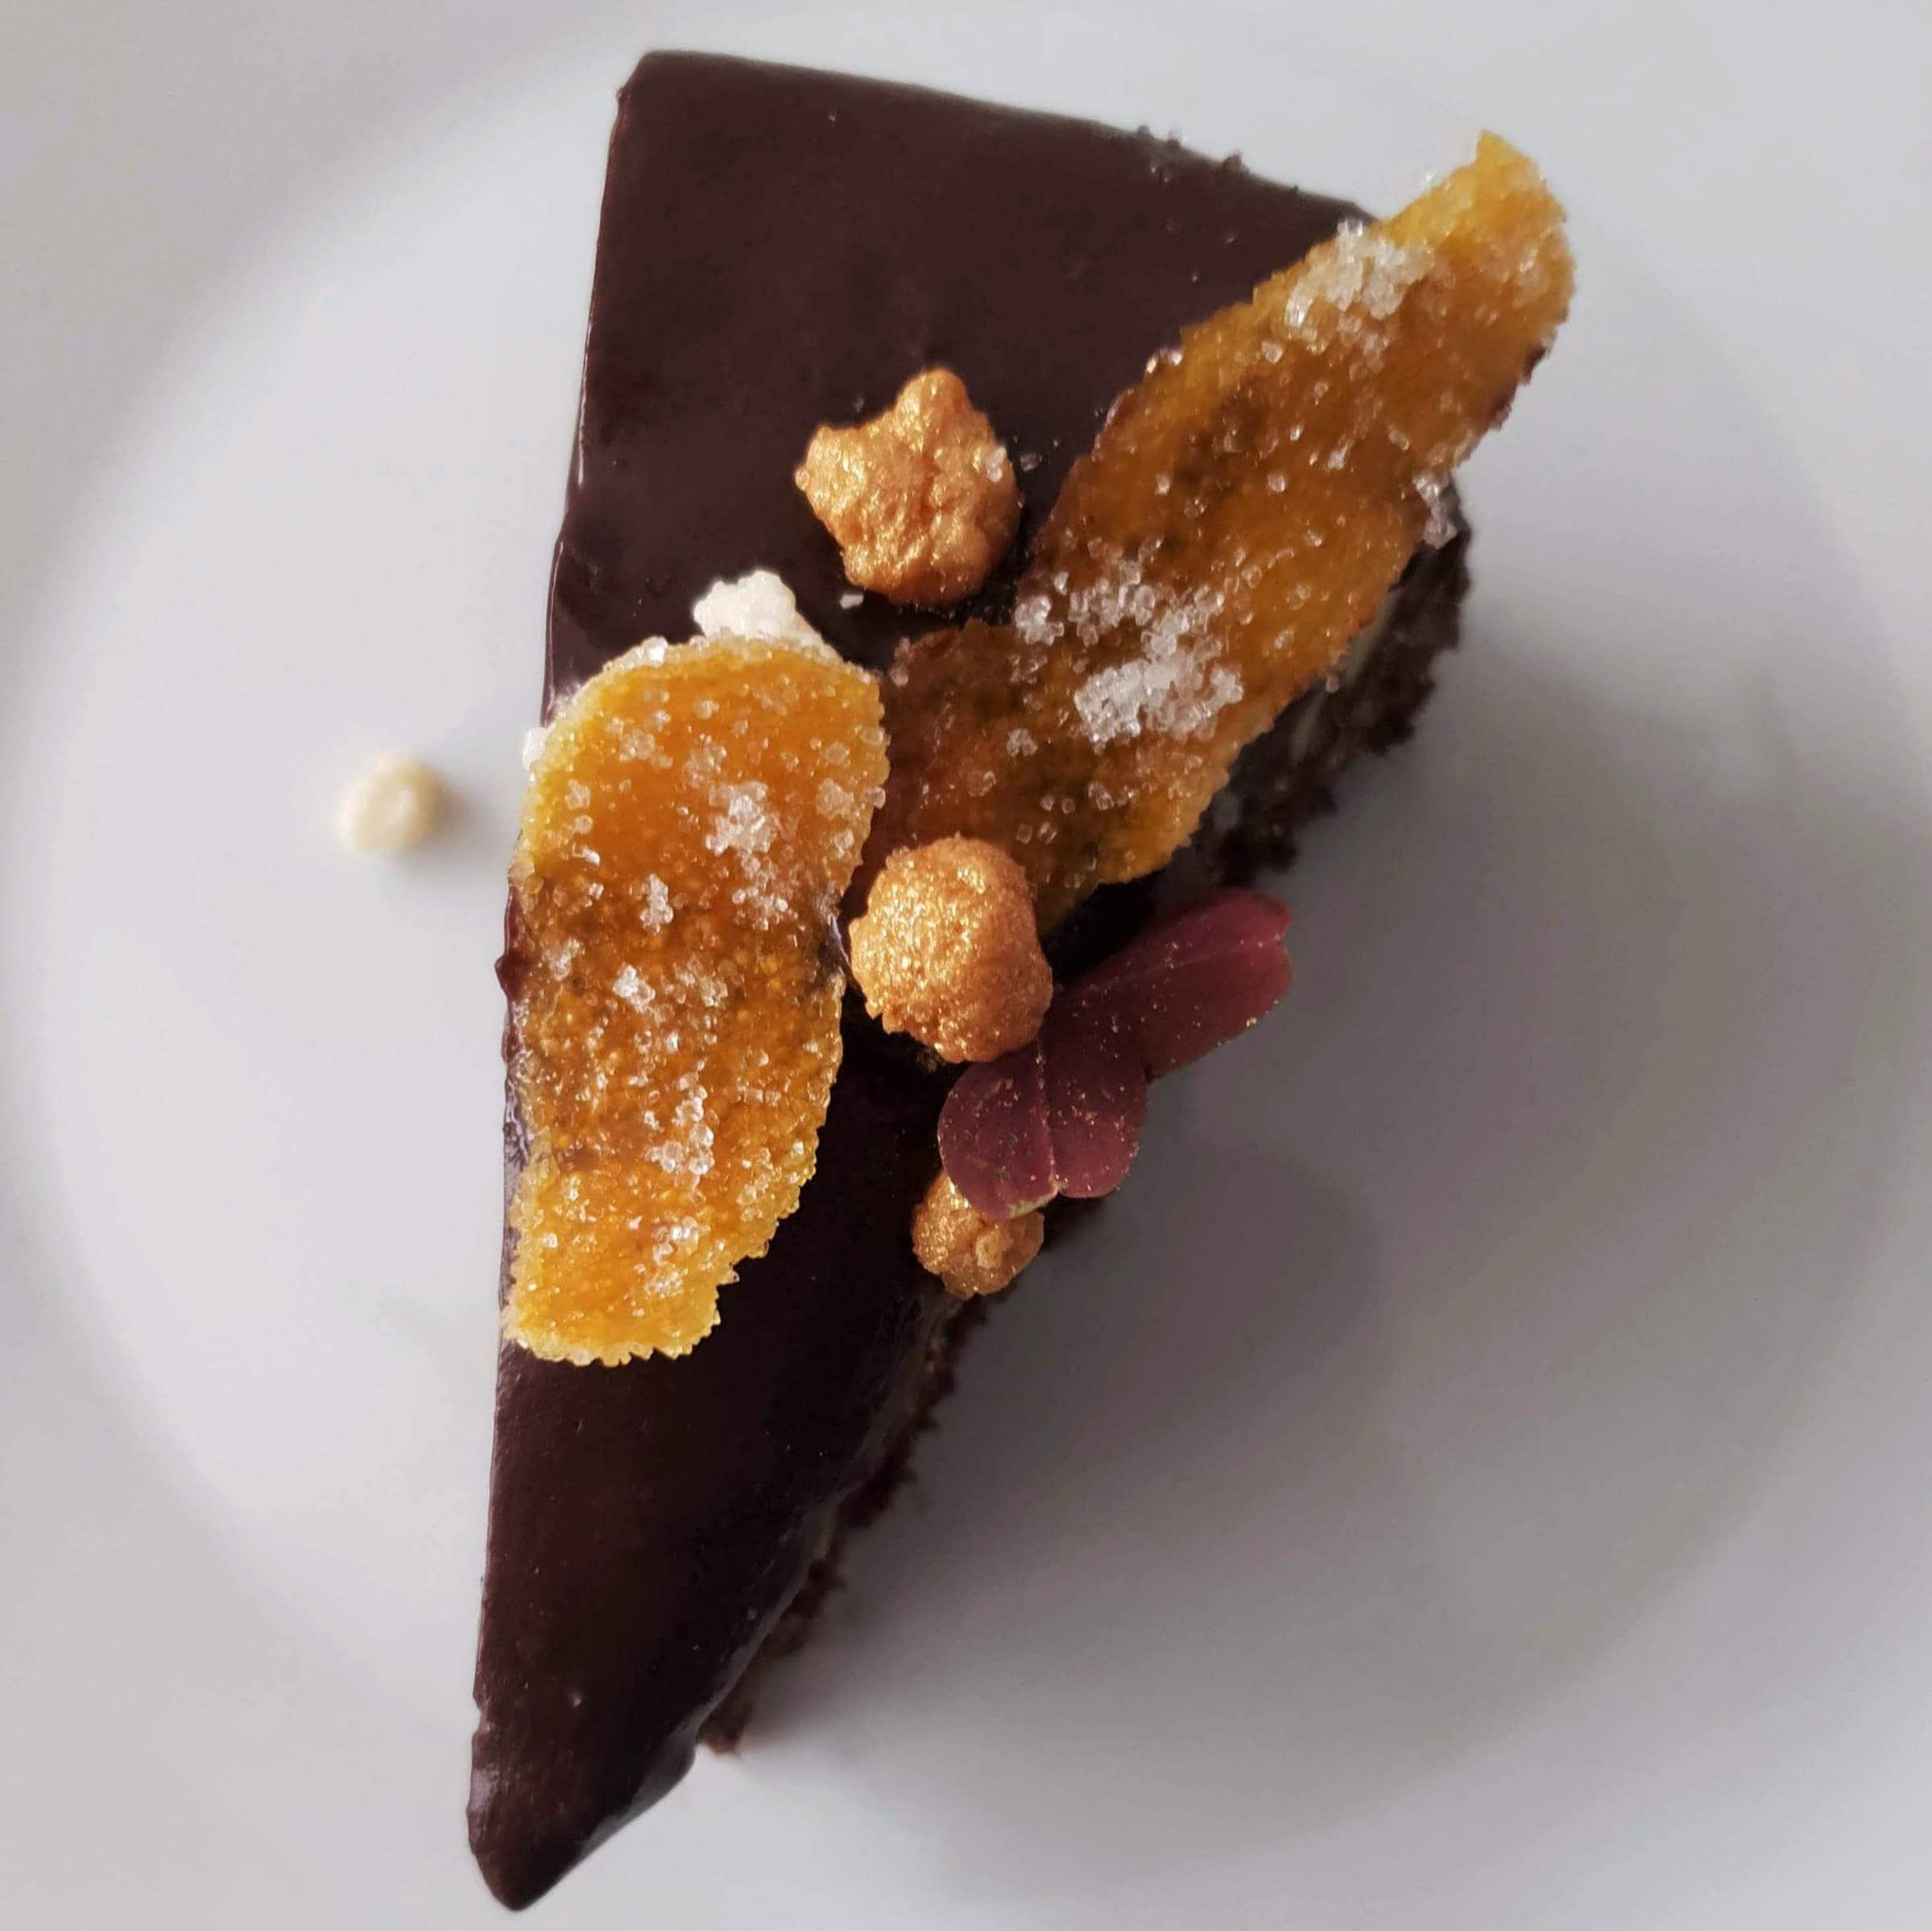 Chokoladelagkage med praliné knas, mokkamousse og appelsinchokoladeglasur. En lækker luksus moussekage til fødselsdag og fest. Prøv denne lagkage, hvis du er til chokolade, appelsin og kaffe. Find opskrifter, gratis print og inspiration til årets gang på danishthings.com #DanishThings #chokoladelagkage #chokoladelagkage-med-appelsin-og-kaffe #mousse #appelsinchokoladeglasur #mokkamousse #chokolademousse-med-kaffe #praliné-med-knas #chokoladelagkagebunde-med-appelsin #chokolade #praliné #appelsin #kaffe